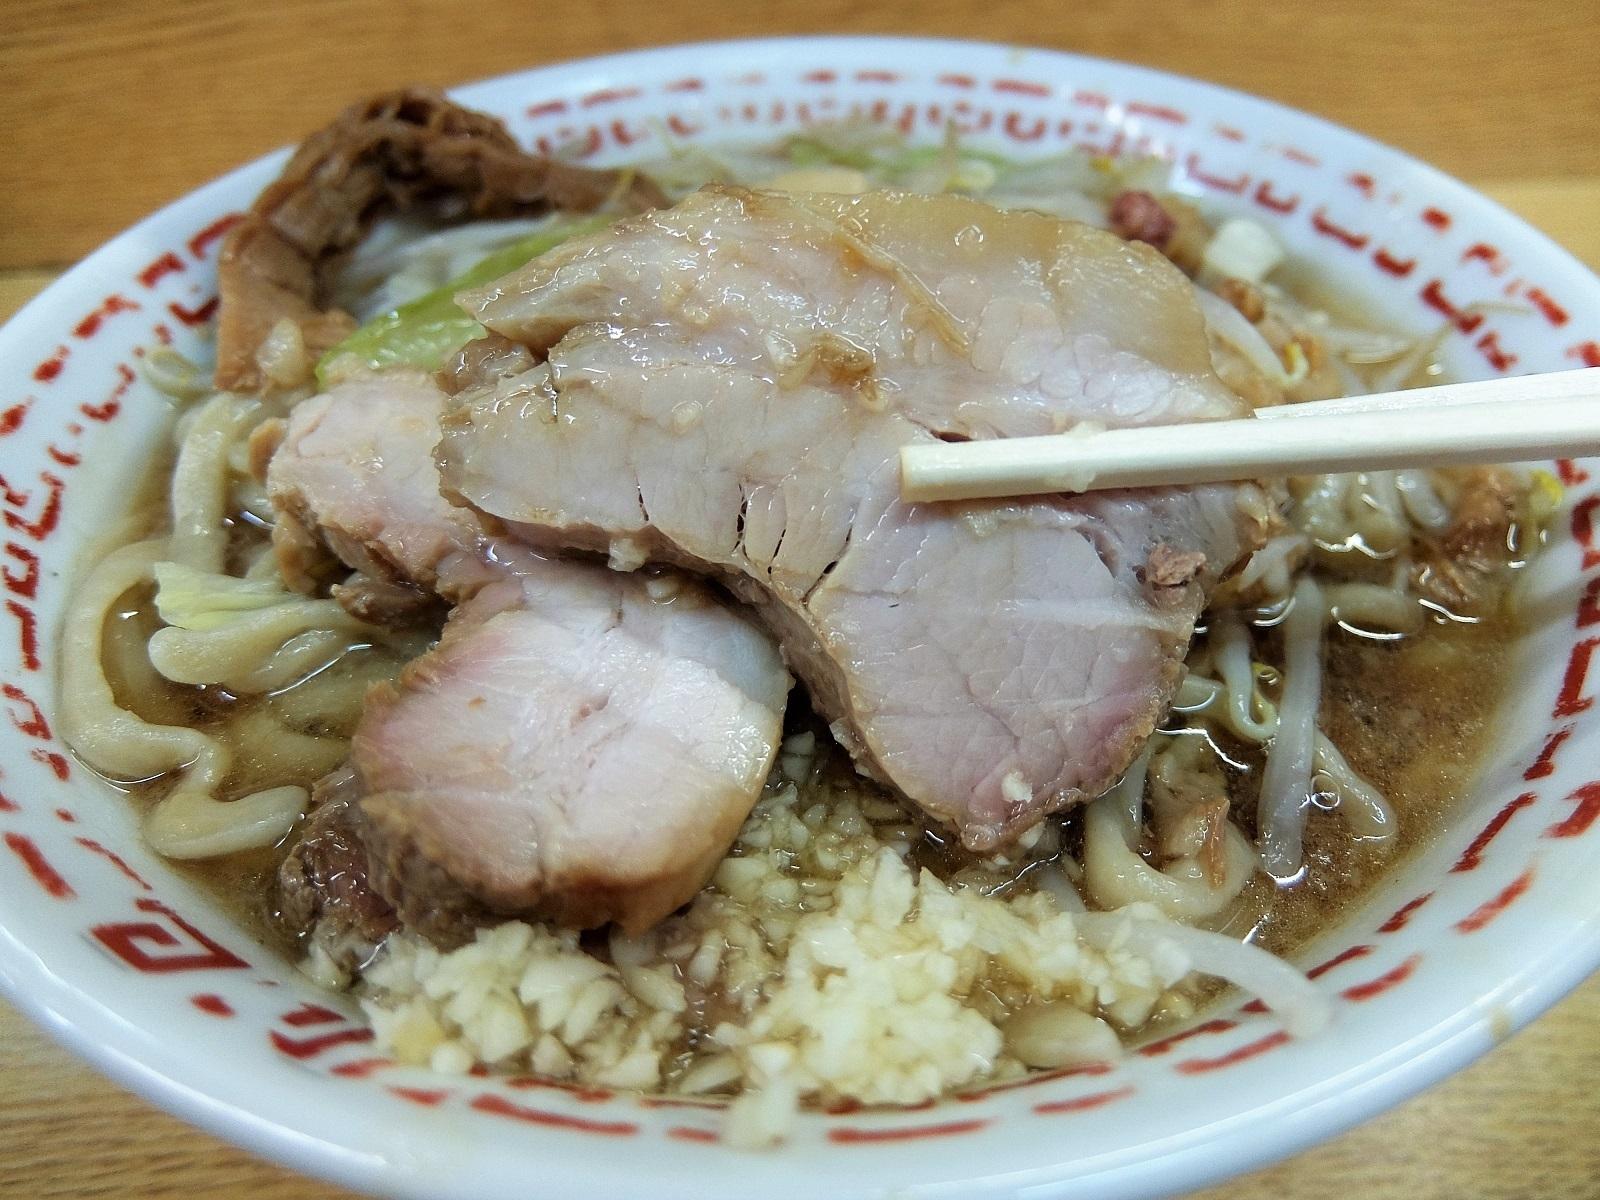 shinshindaita-jirou142c.jpg